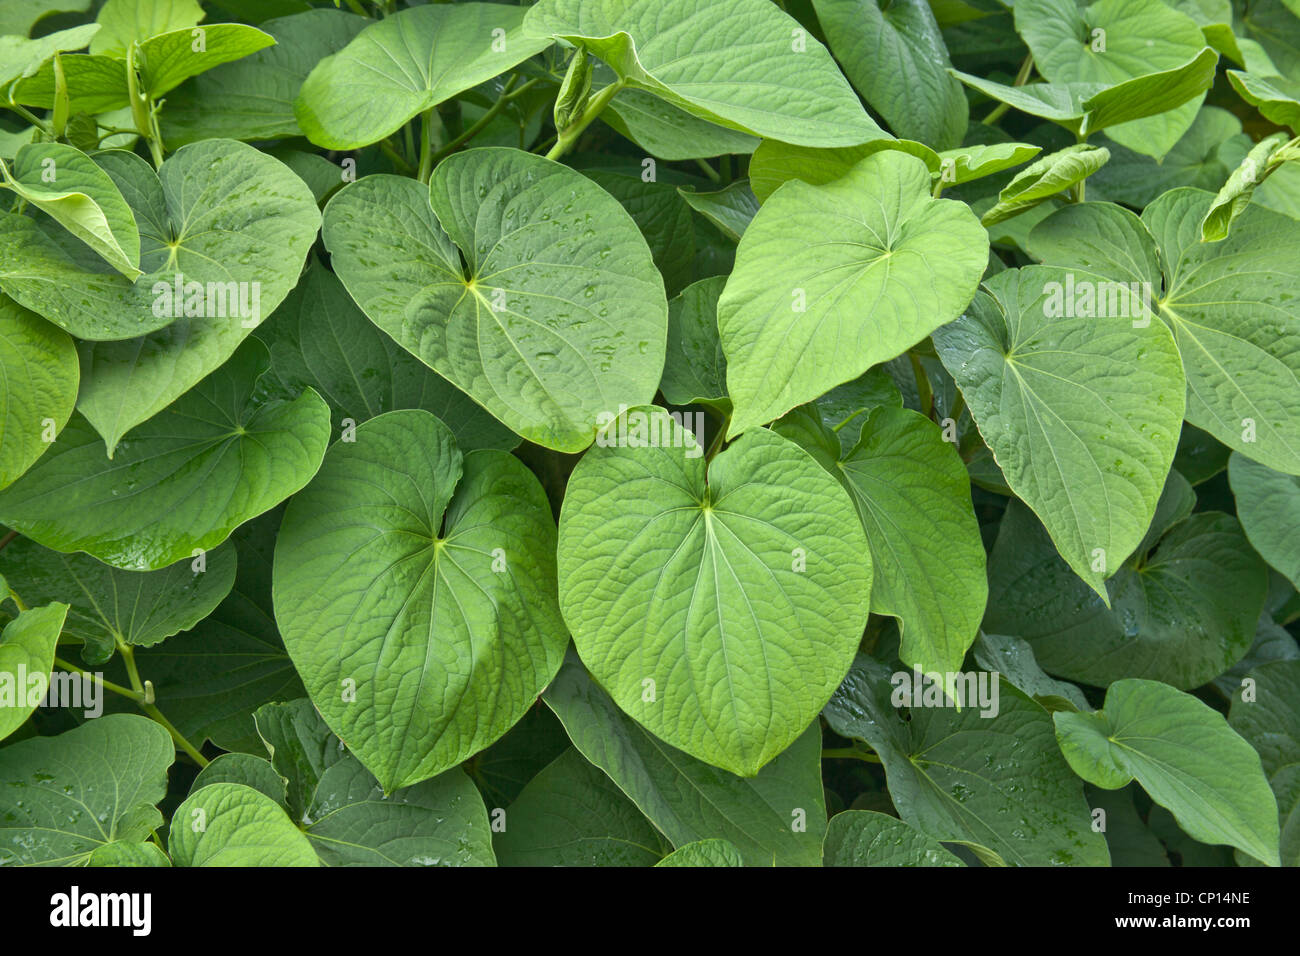 Kava foliage, shrub growing. - Stock Image